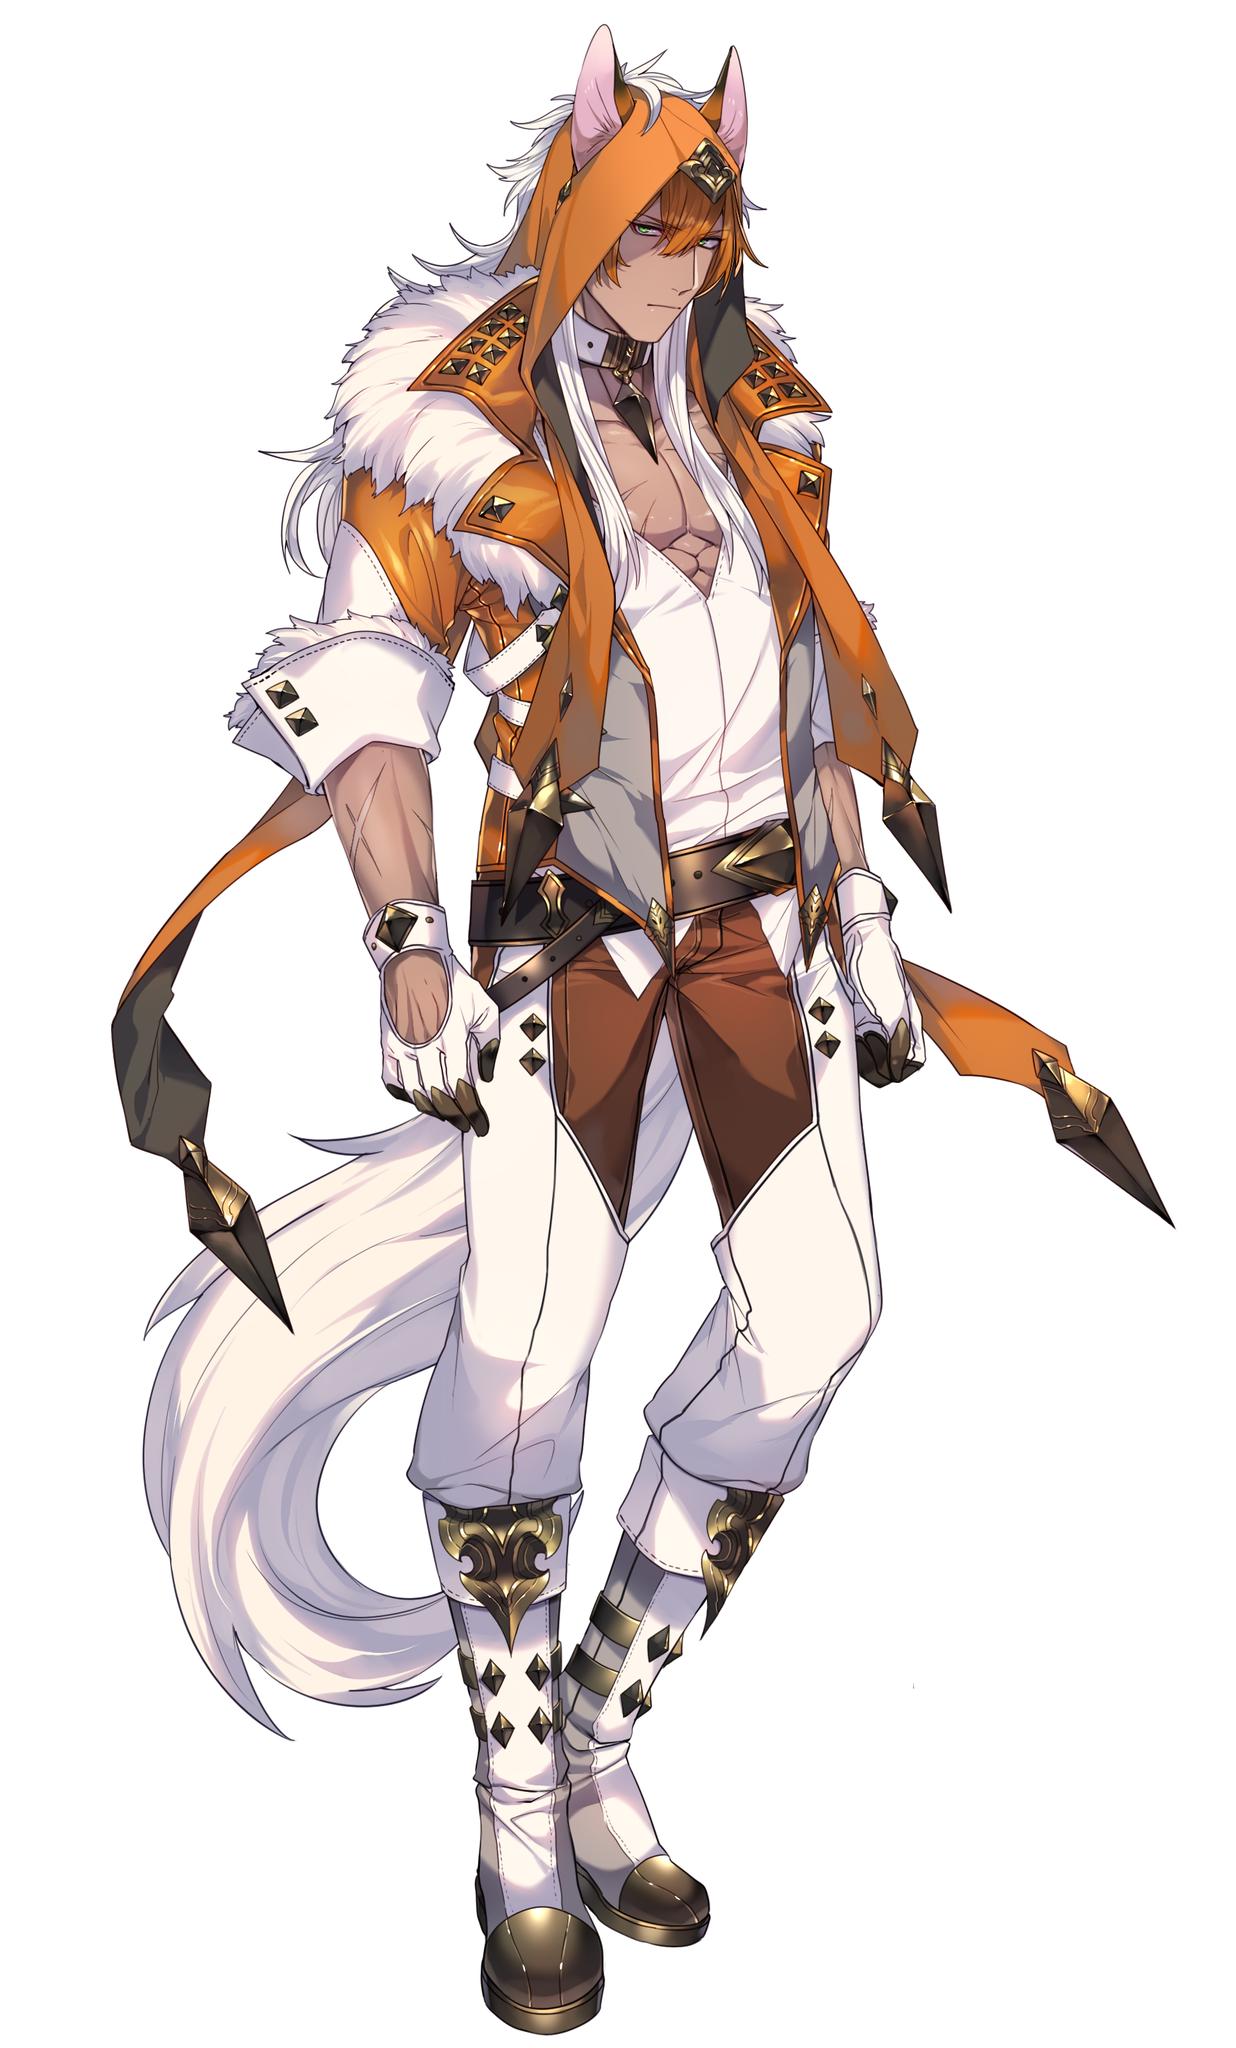 Anime Wolf Ears Male Bokunoheroacademia Katsuki Bakugoucosplay En 2020 Personajes De Fantasia Diseno De Personajes Arte De Personajes